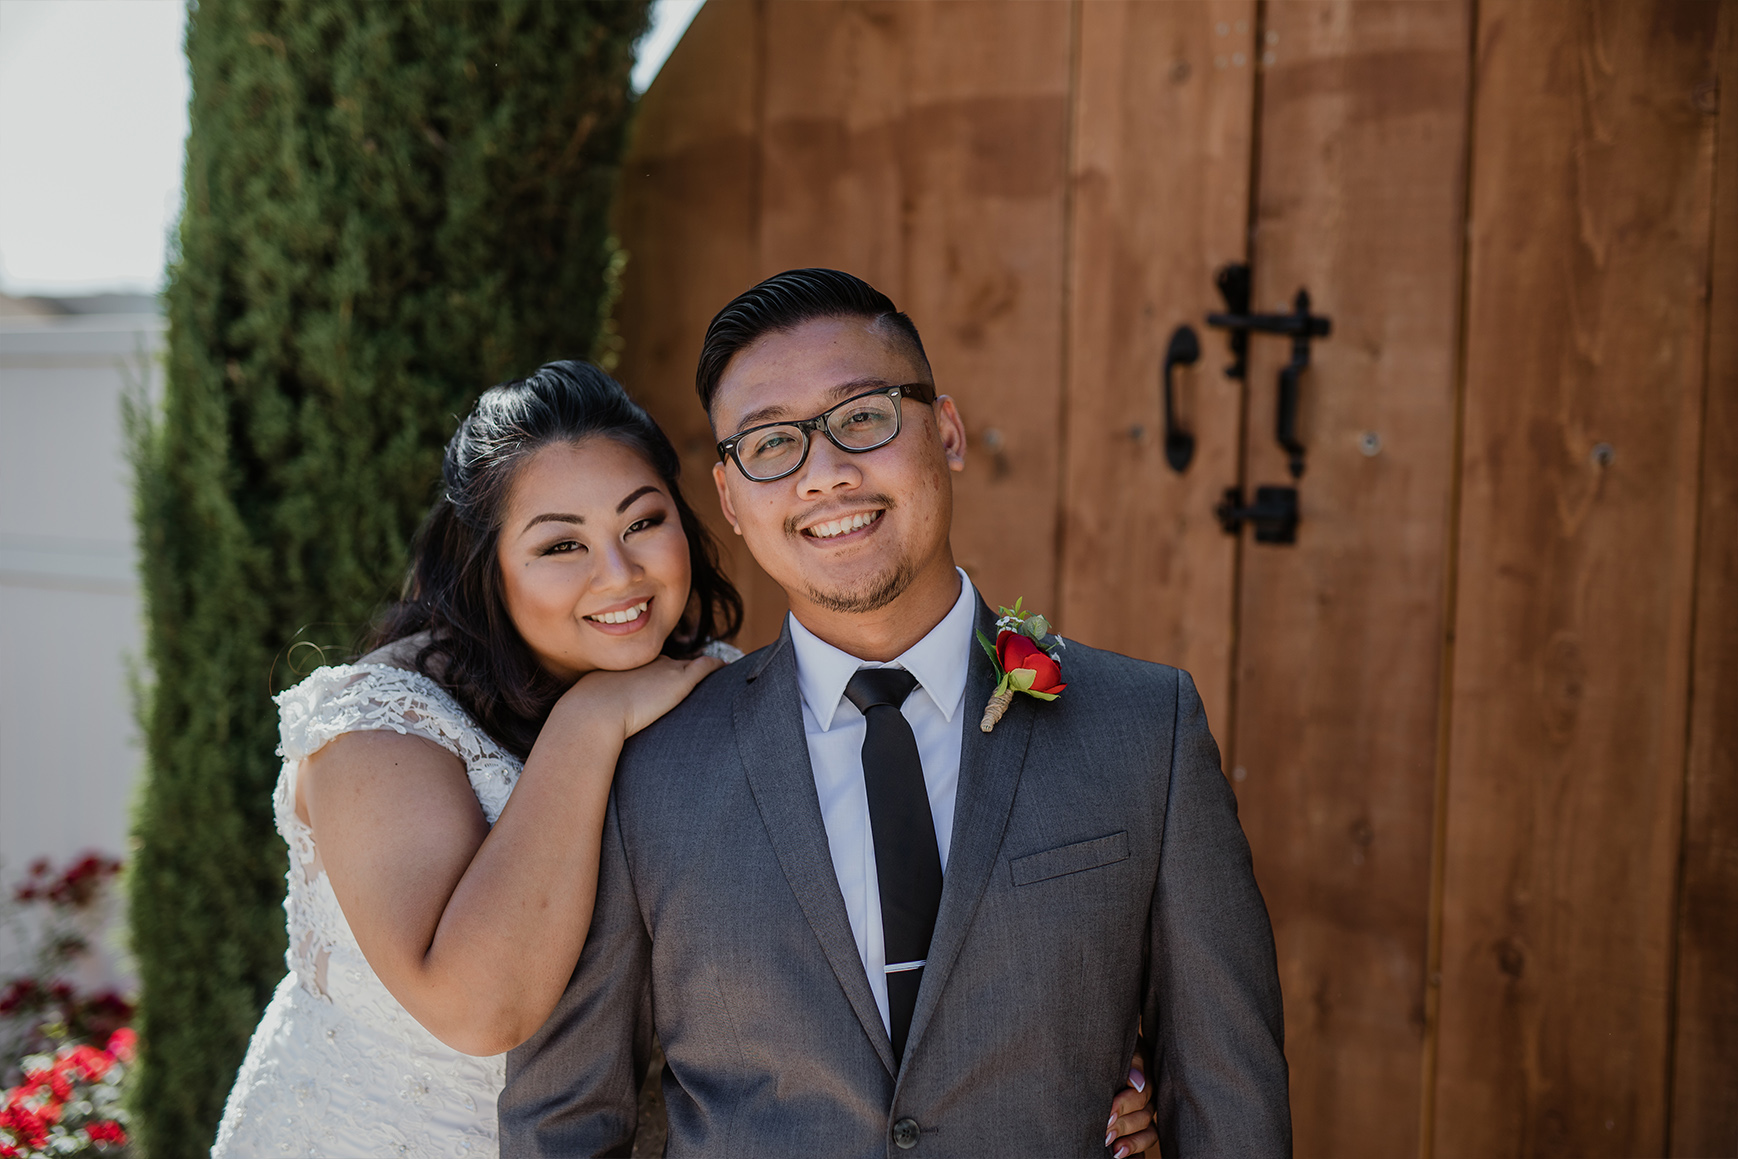 Newlyweds - Fresno - Fresno, California - Frenso County - Wedgewood Weddngs